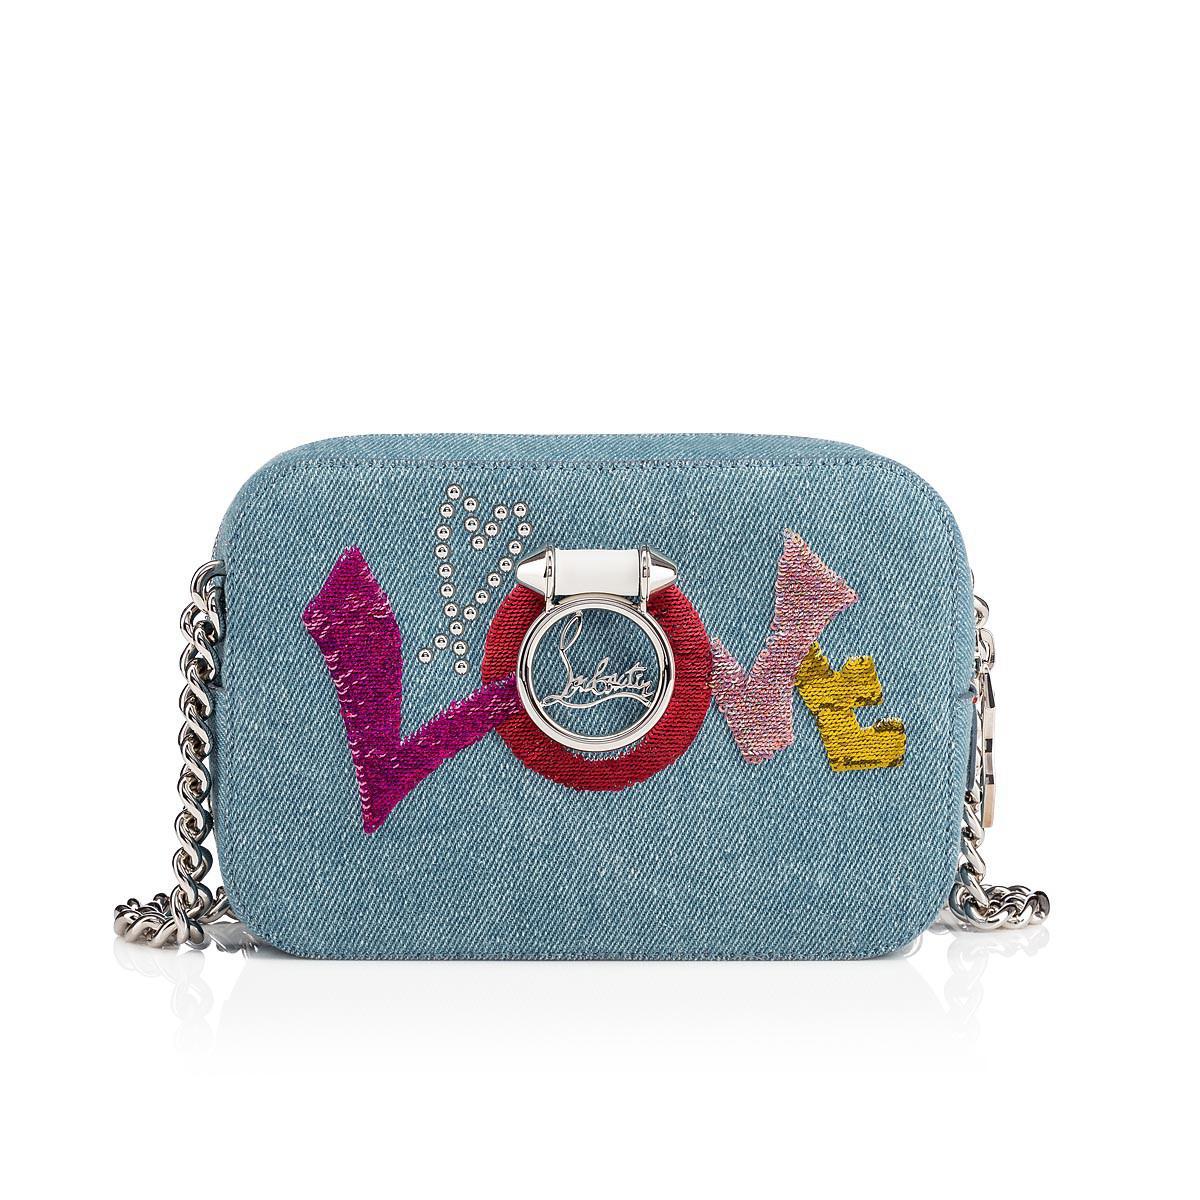 9633b28912a Christian Louboutin Rubylou Mini Love Denim Crossbody Bag in Blue - Lyst